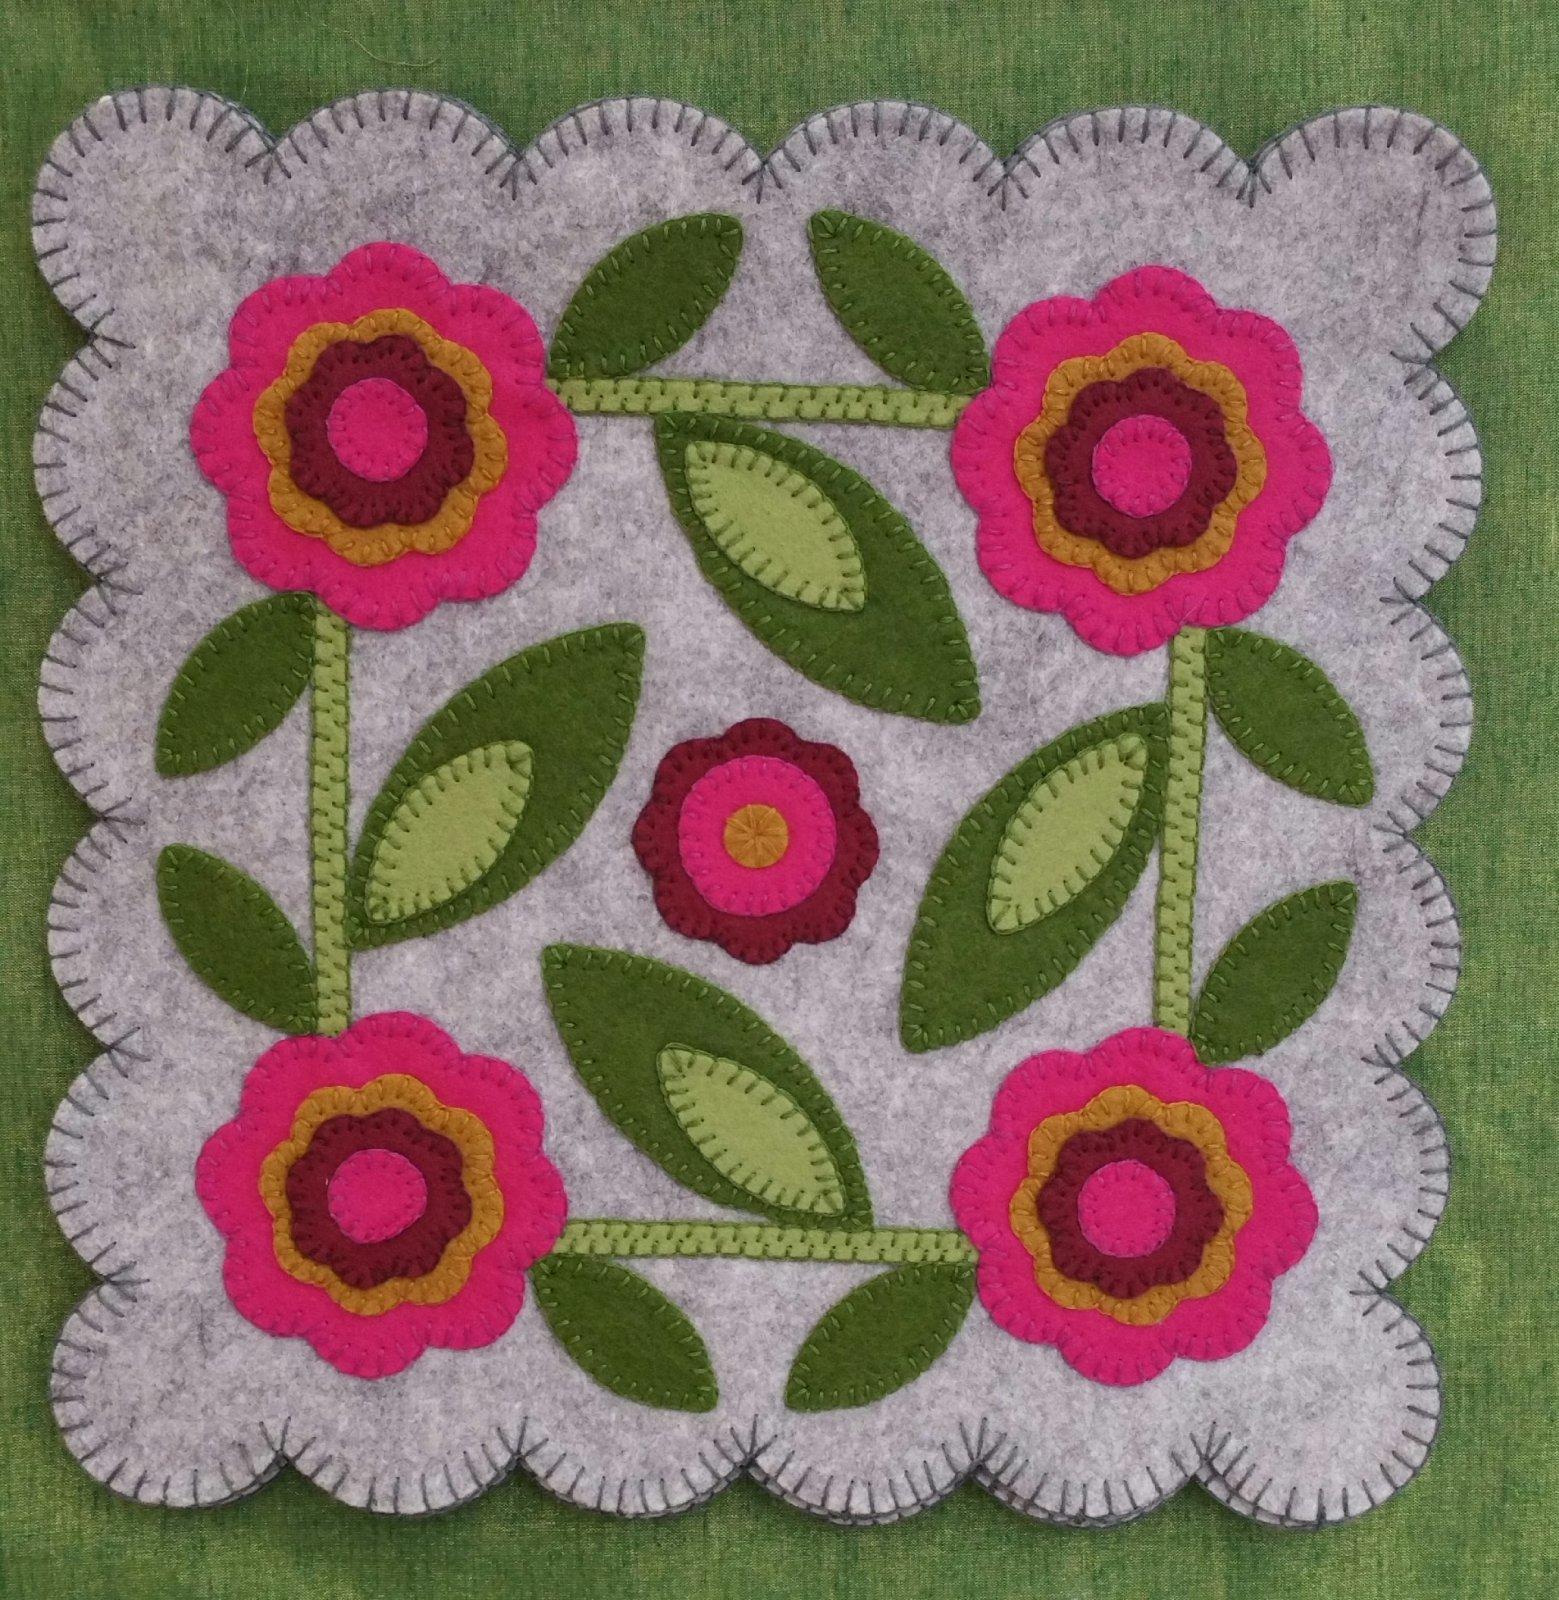 Rose of Sharon Block #4